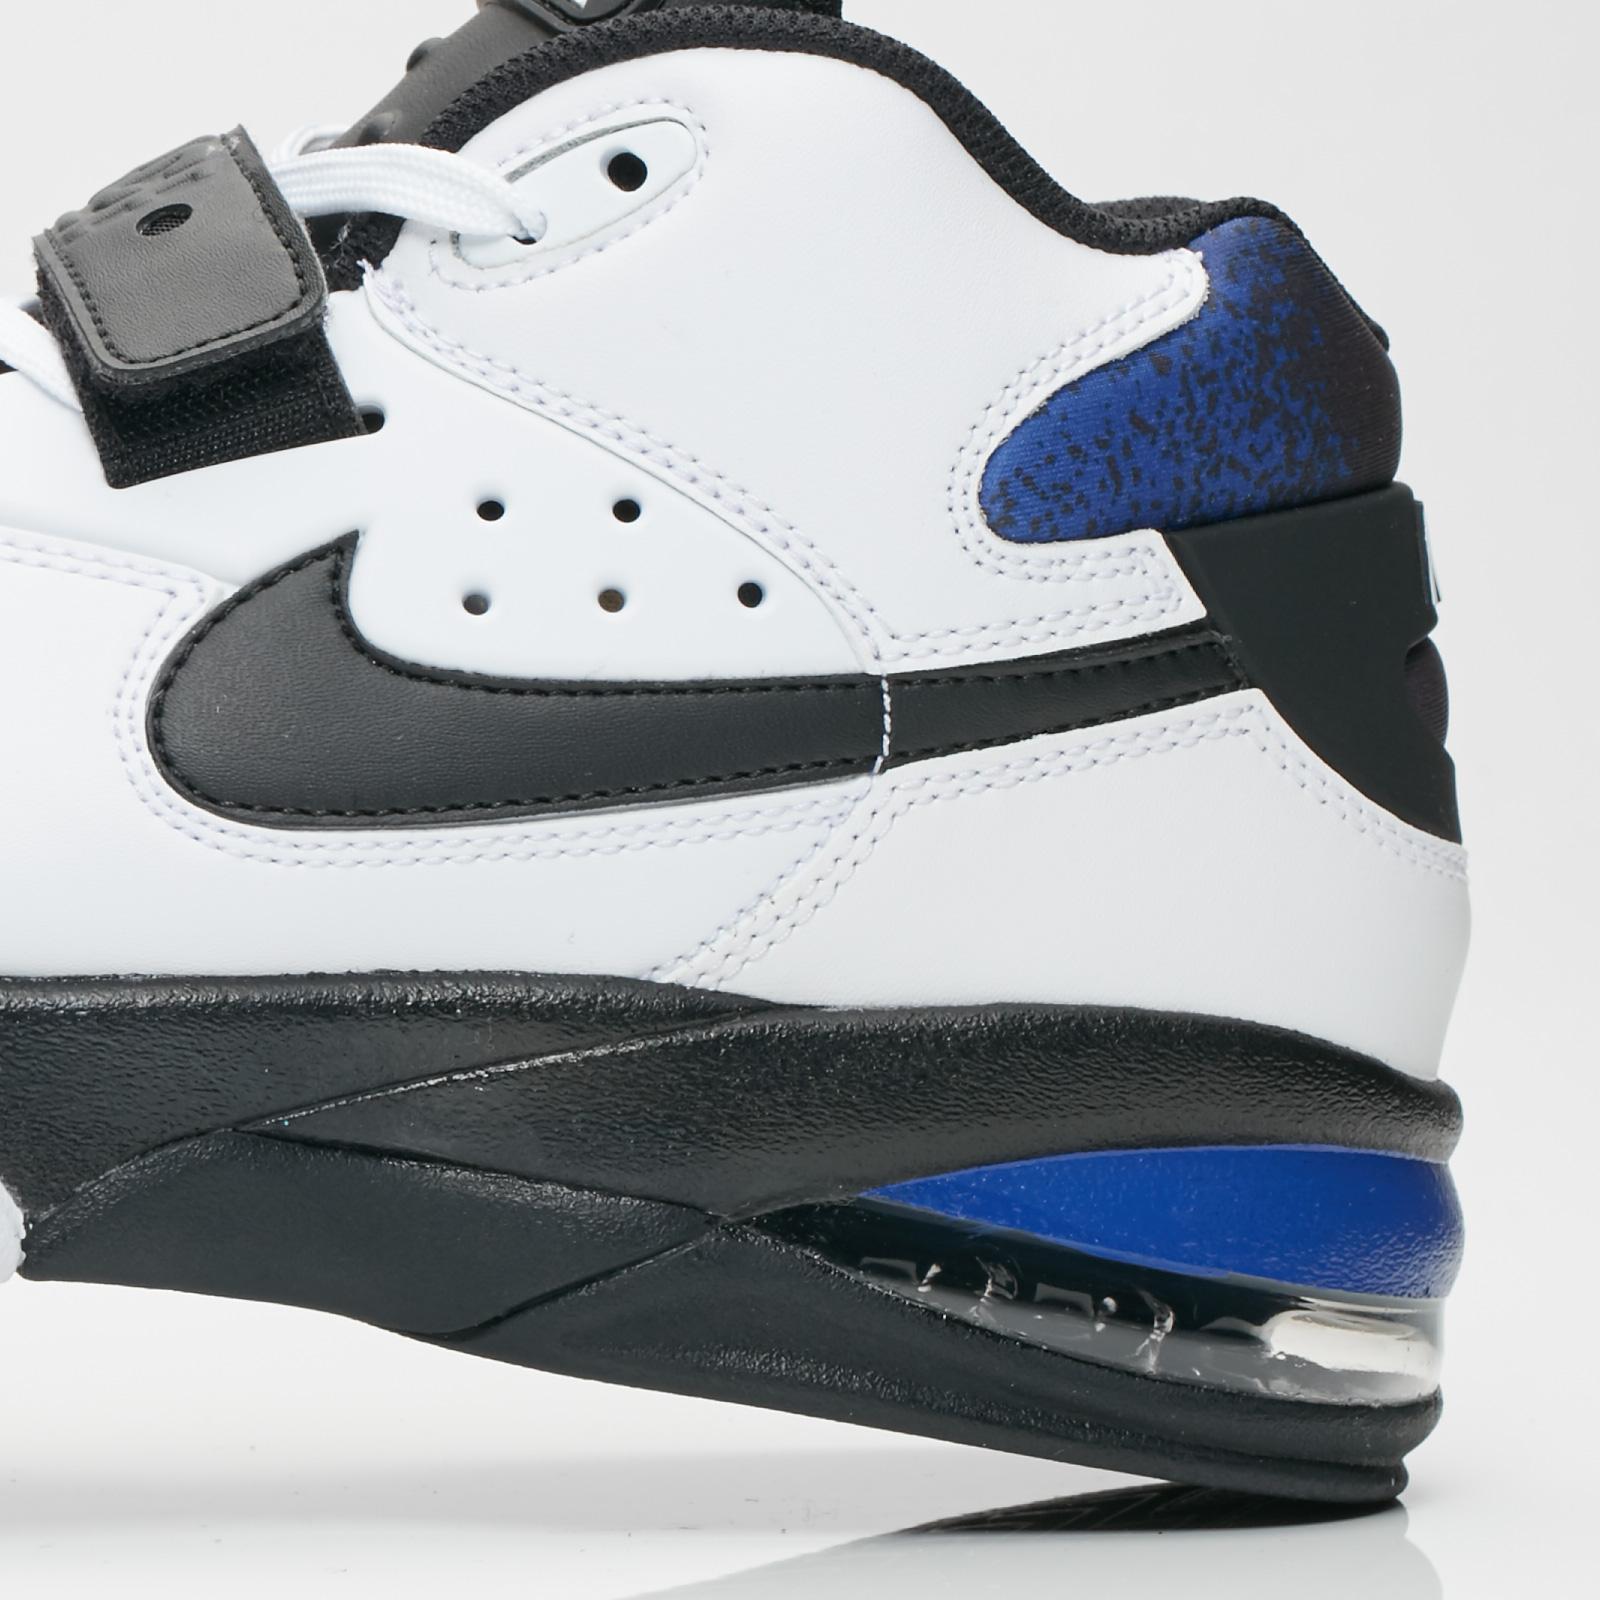 quality design 85ece 74e31 ... Nike Sportswear Air Force Max 93